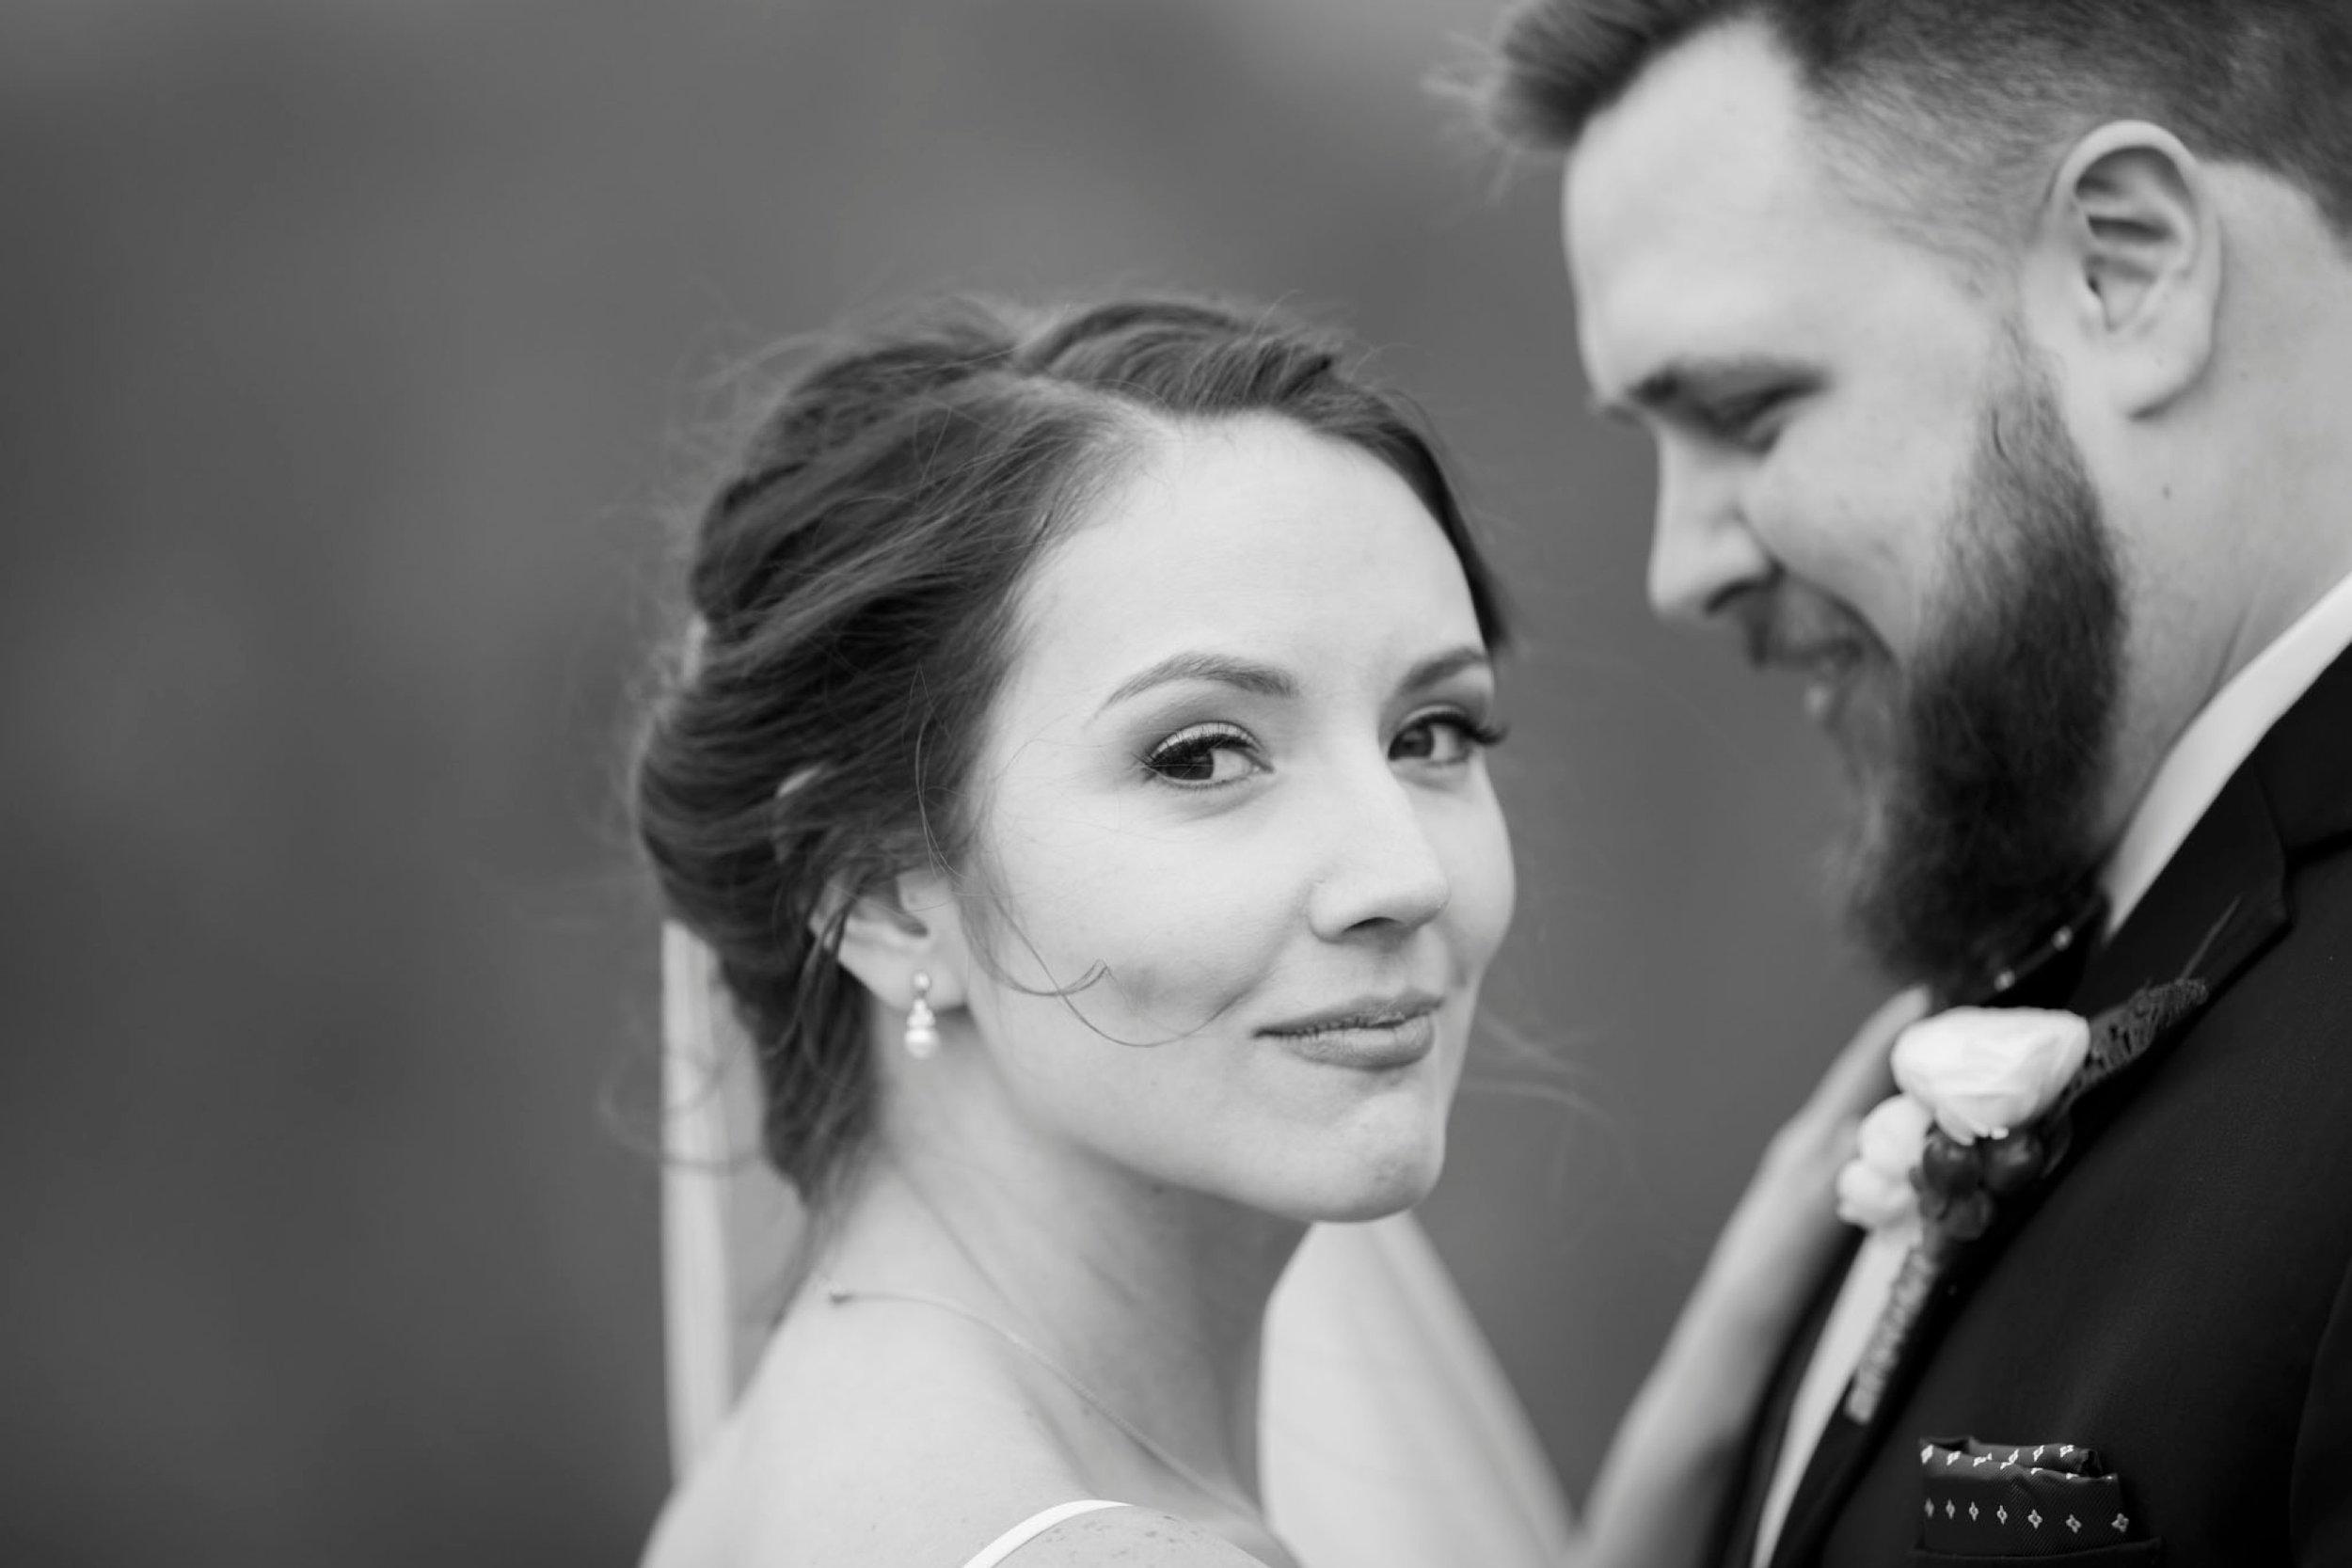 IrvineEstate_LexingtonVA_Wedding_FallWedding_VirginiaWeddingPhotographer 88.jpg